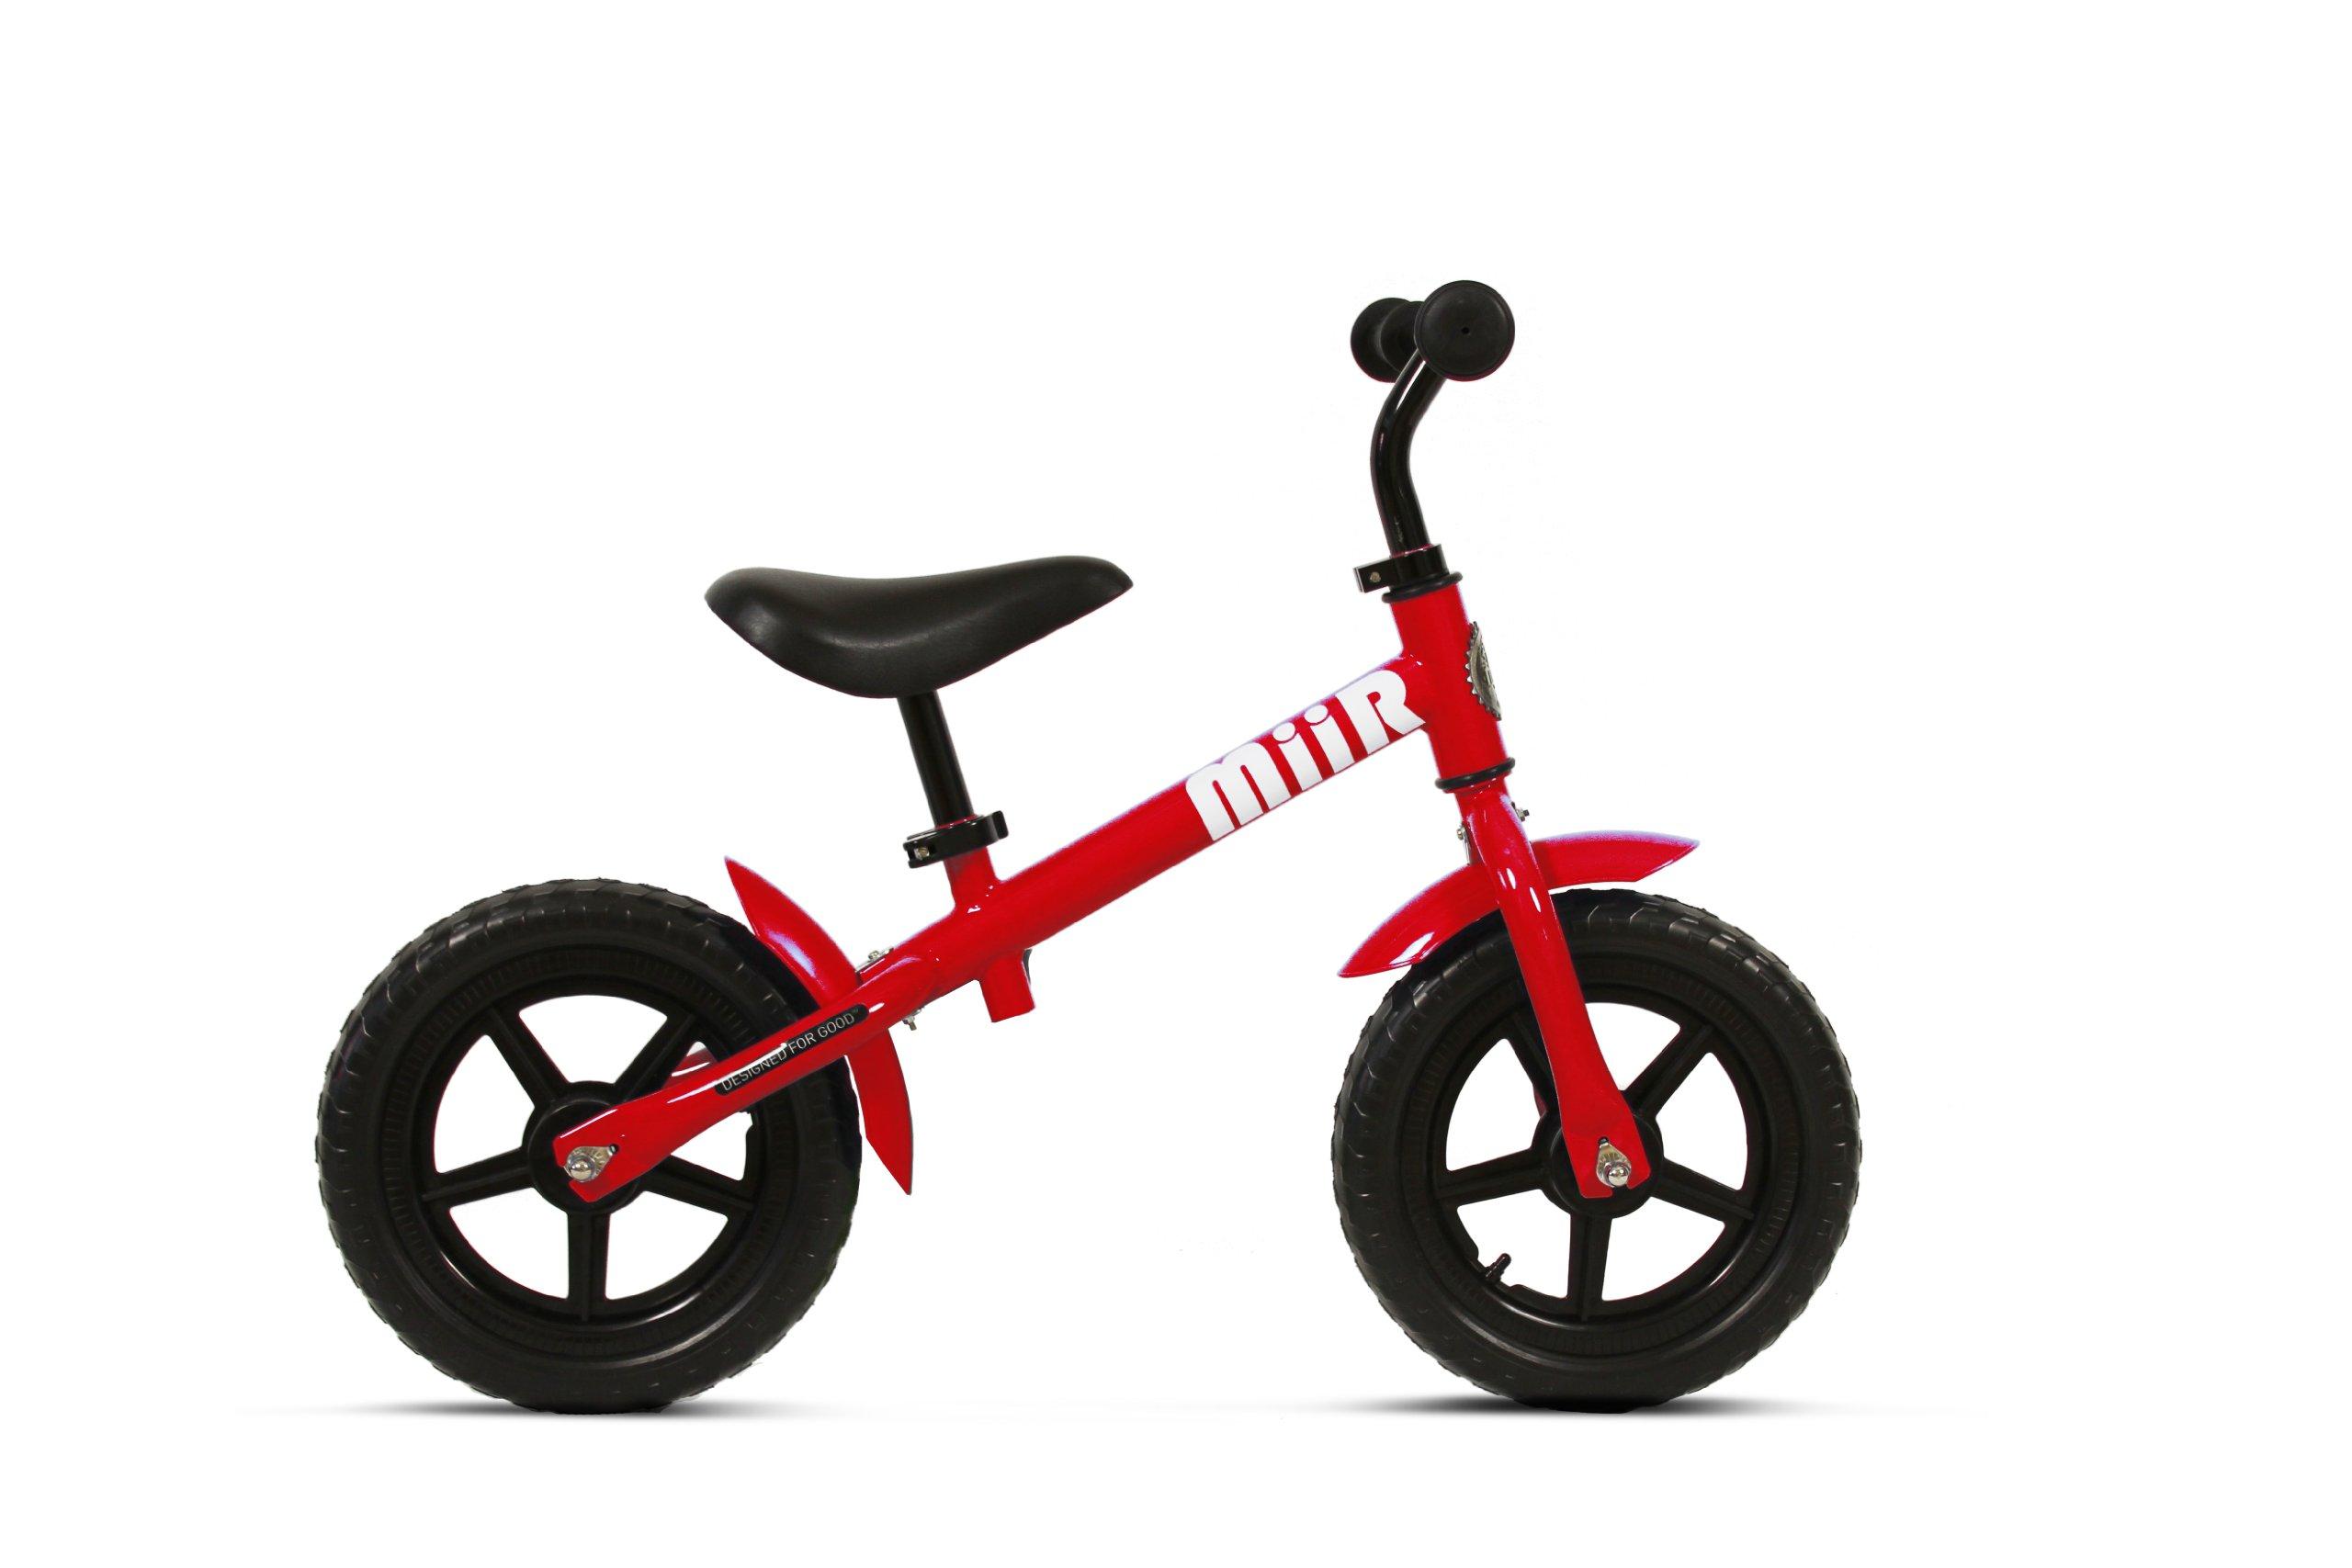 MiiR Youth Bambini Bike, Red